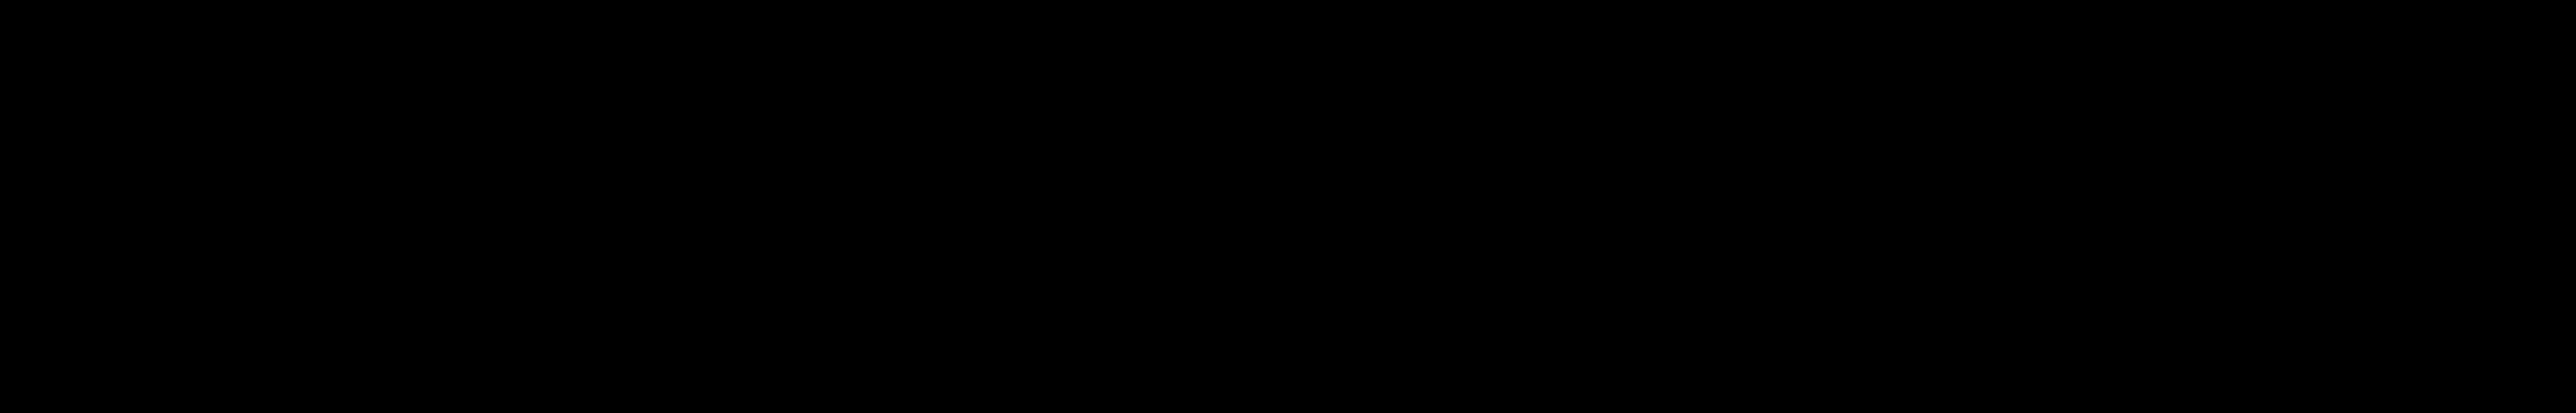 Yahoo Finance Logo Transparent Financeviewer